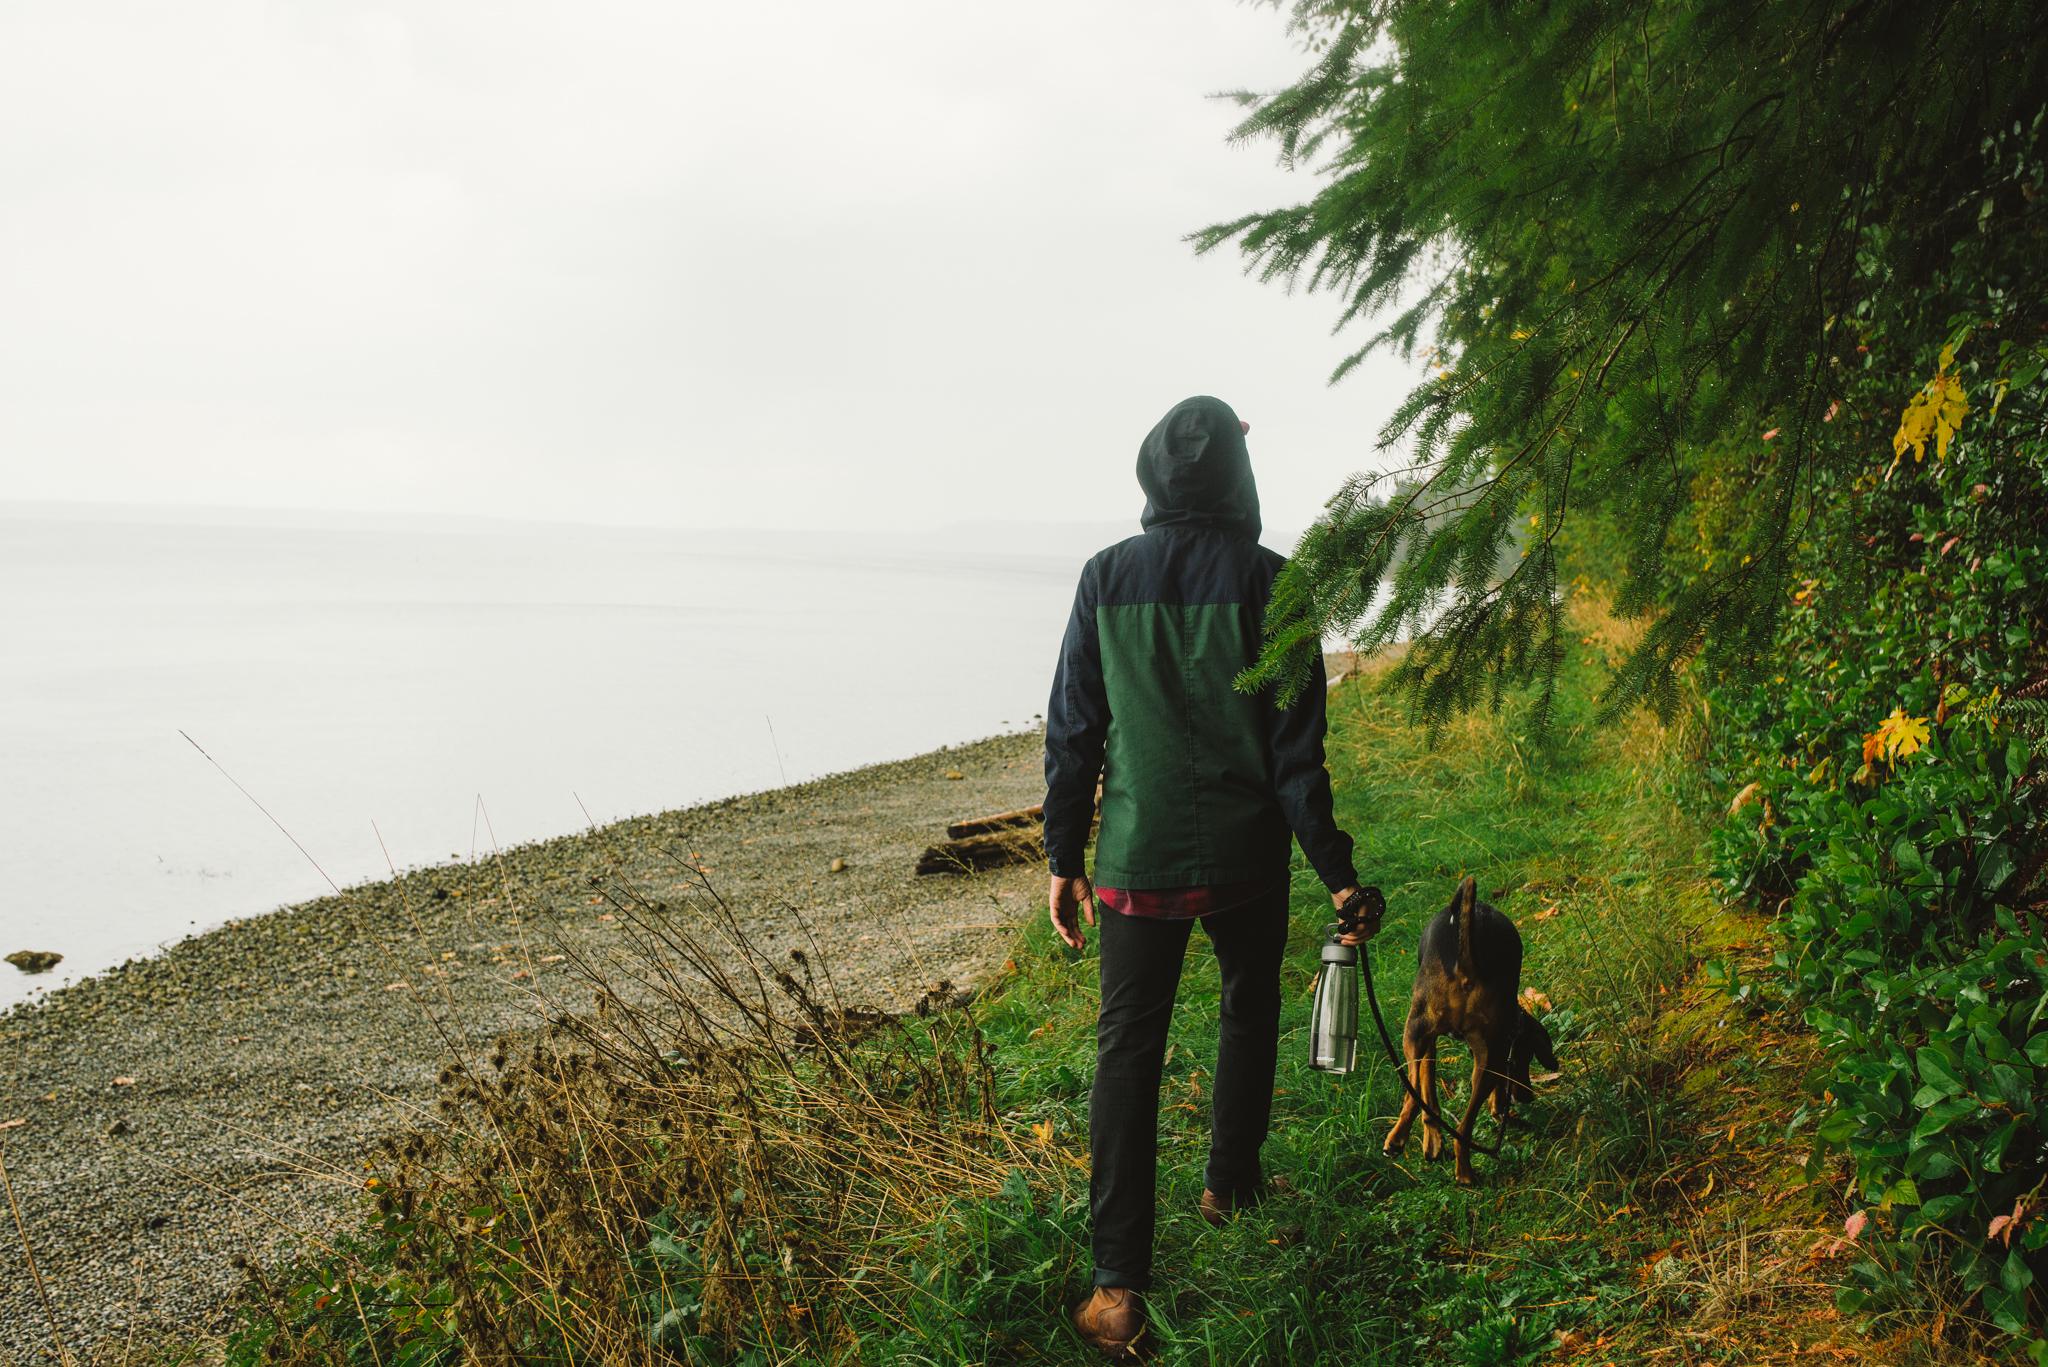 The Ryans Photography - Washington Drizzling Camping Adventure-013.jpg